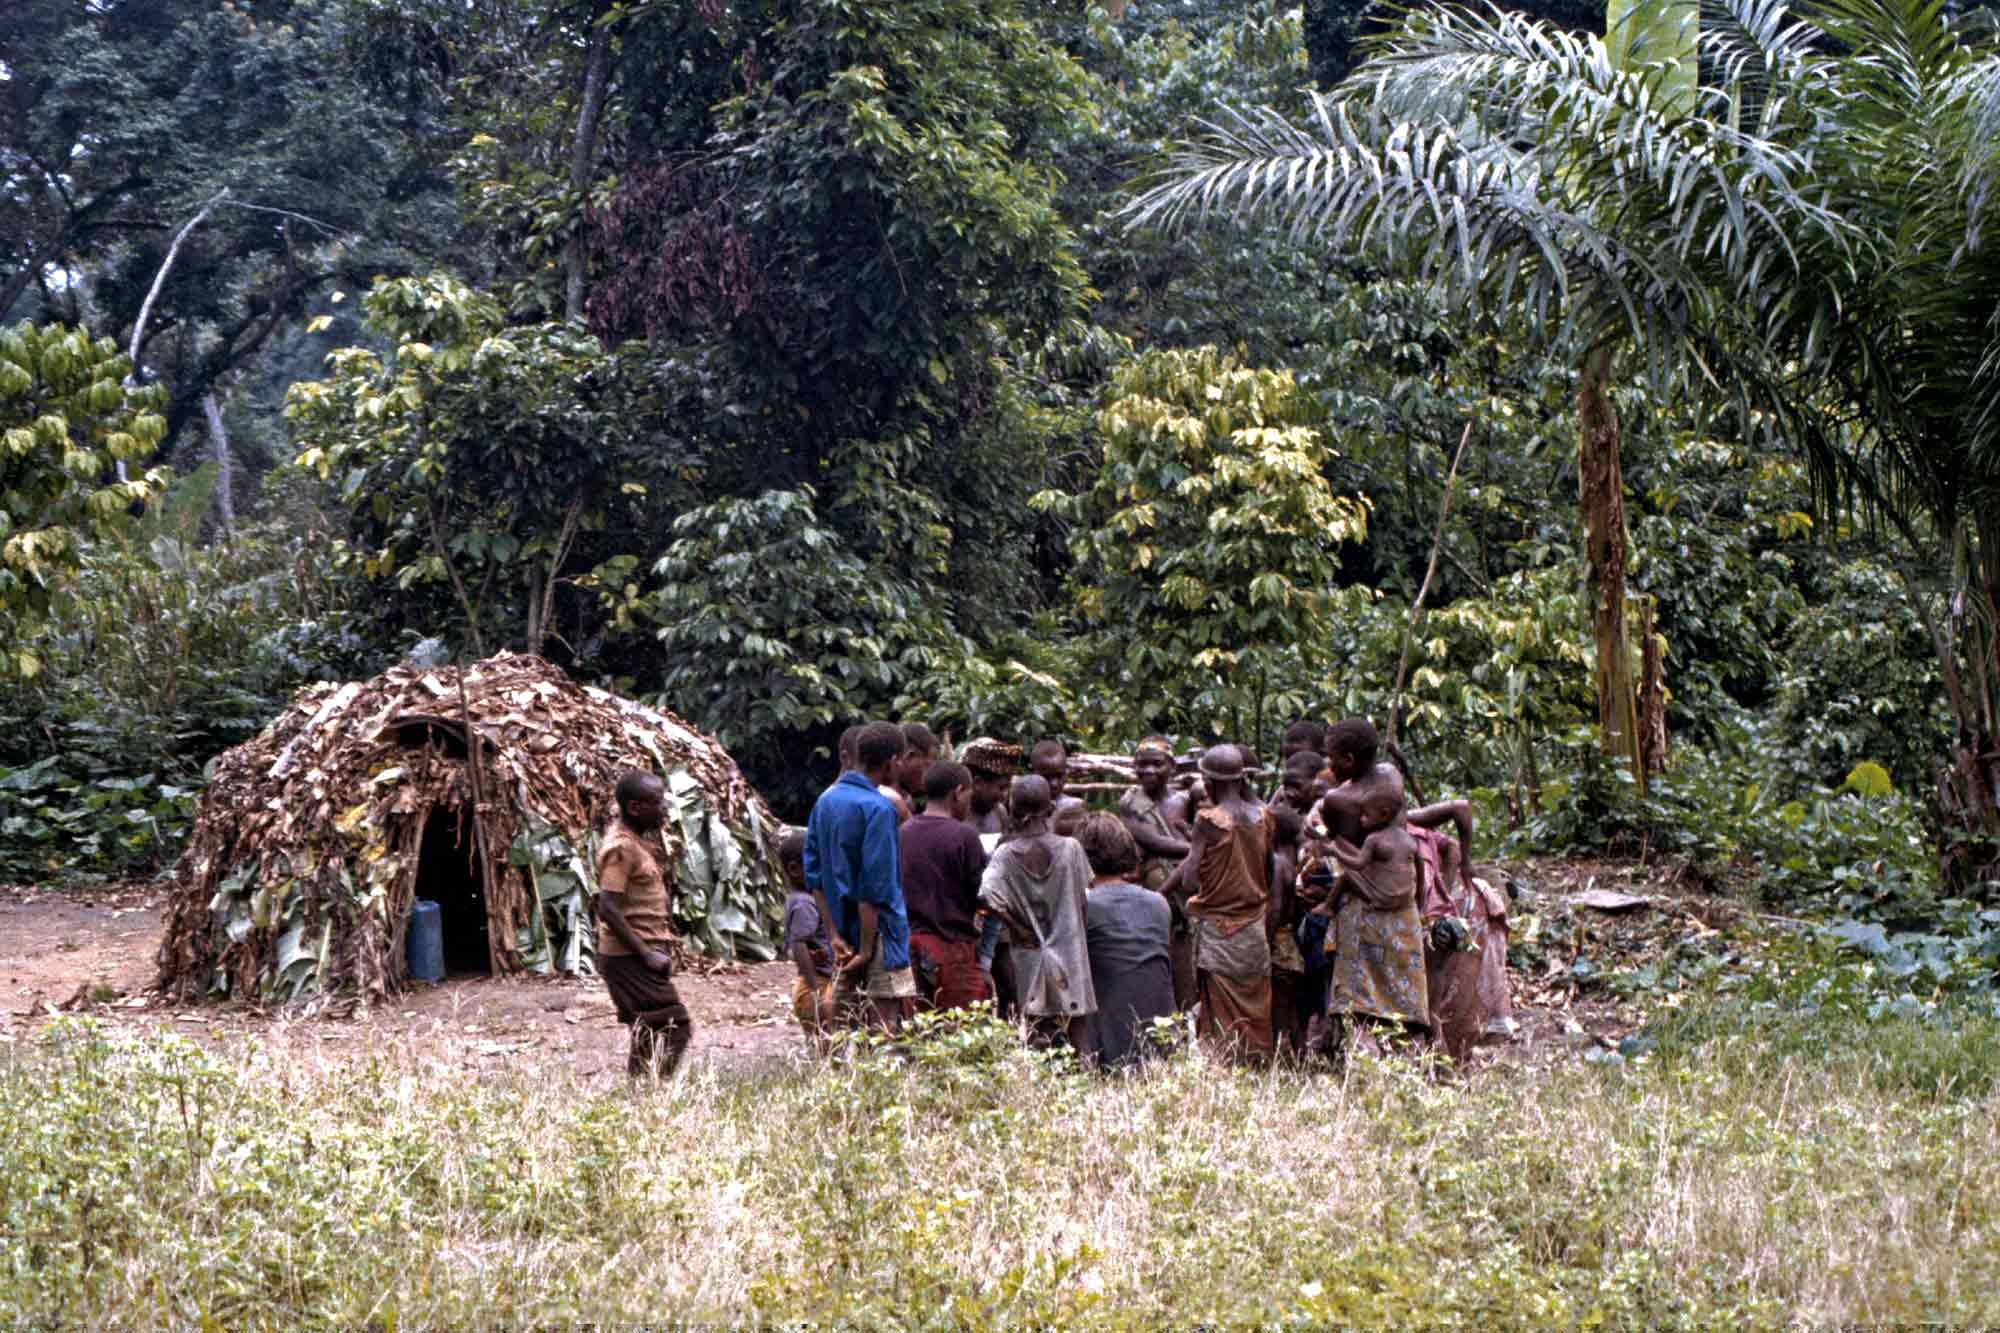 pygmees-congo-jungle-africa